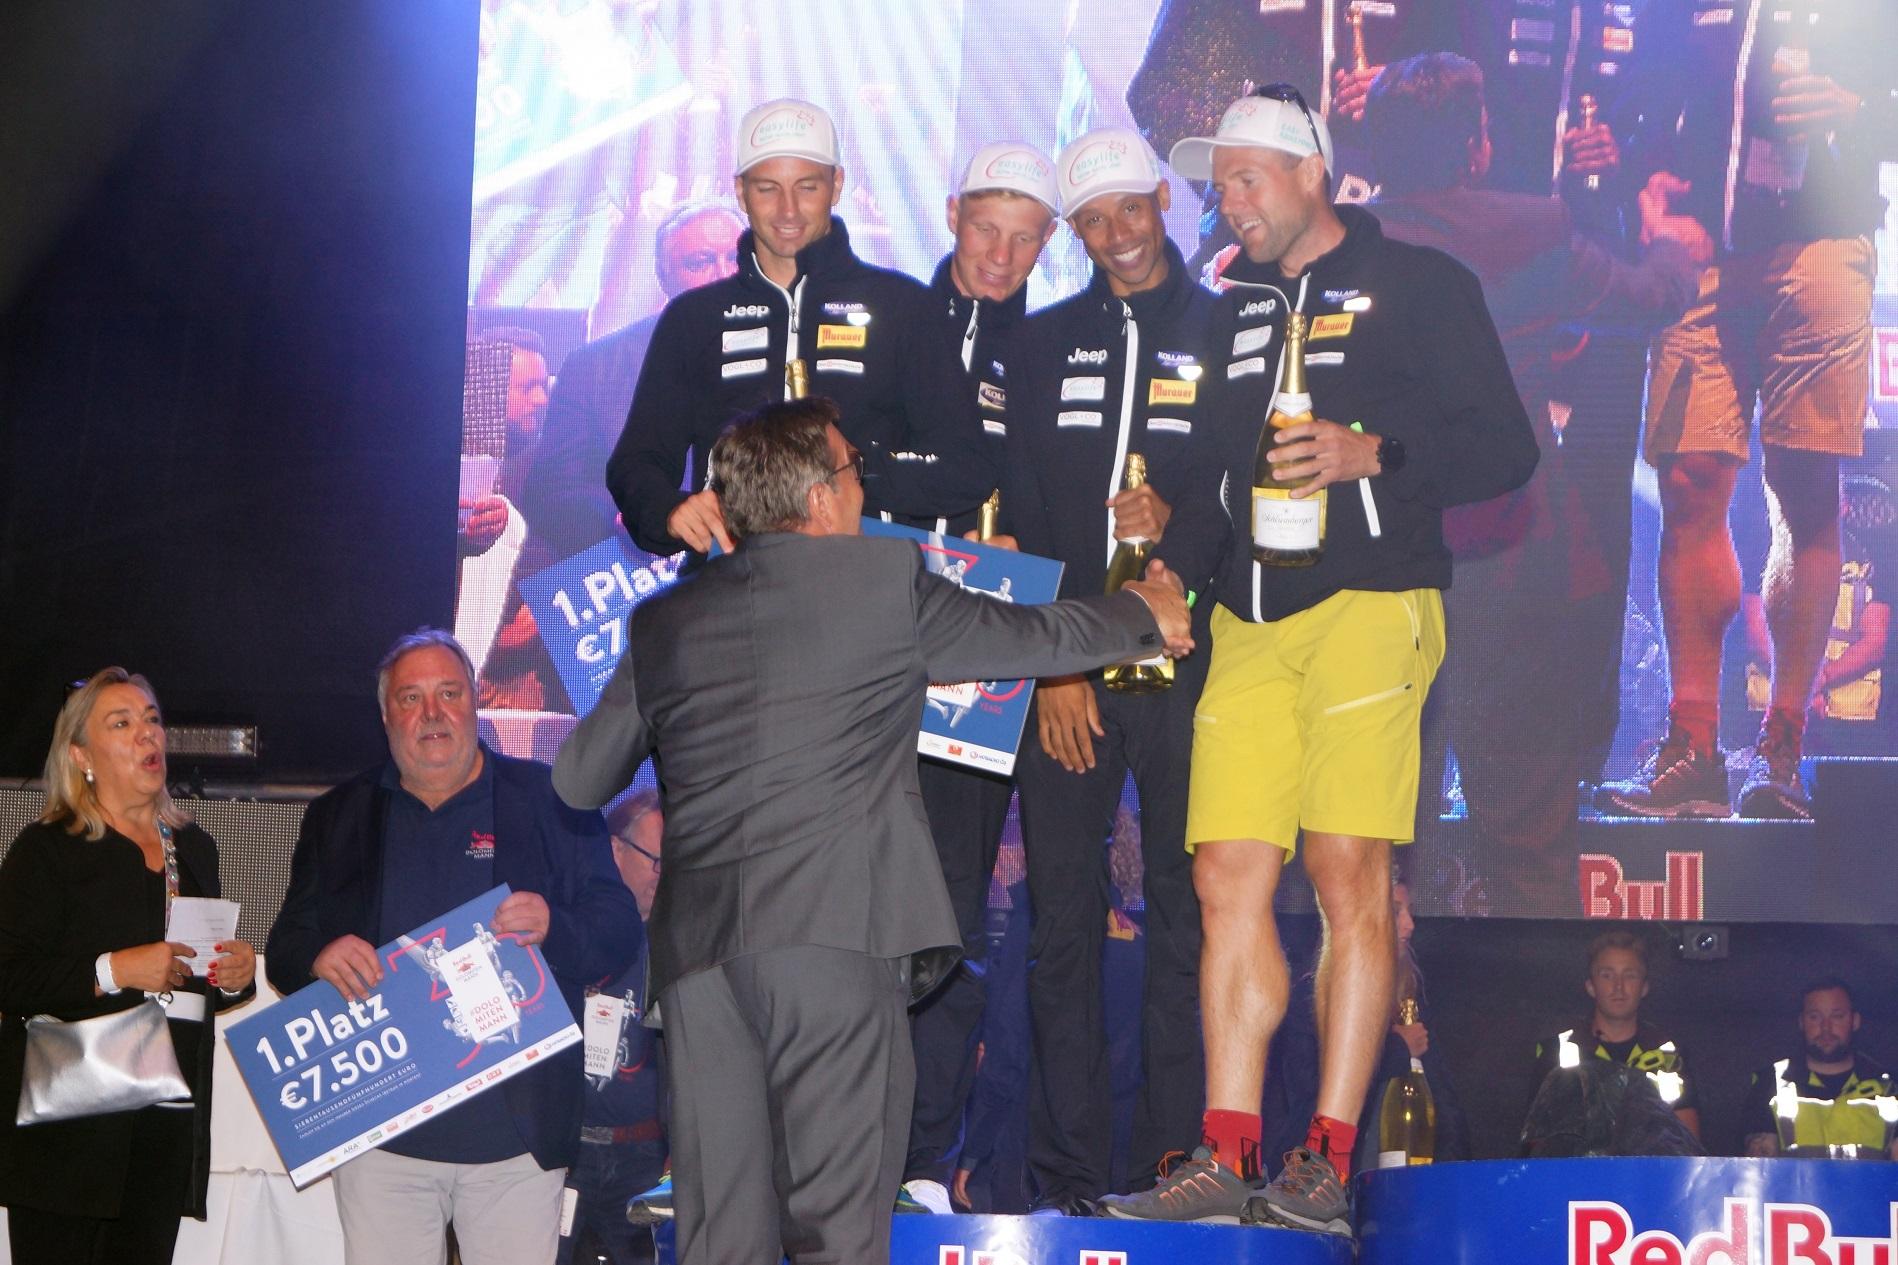 Kolland Topsport Professional auf Platz 2